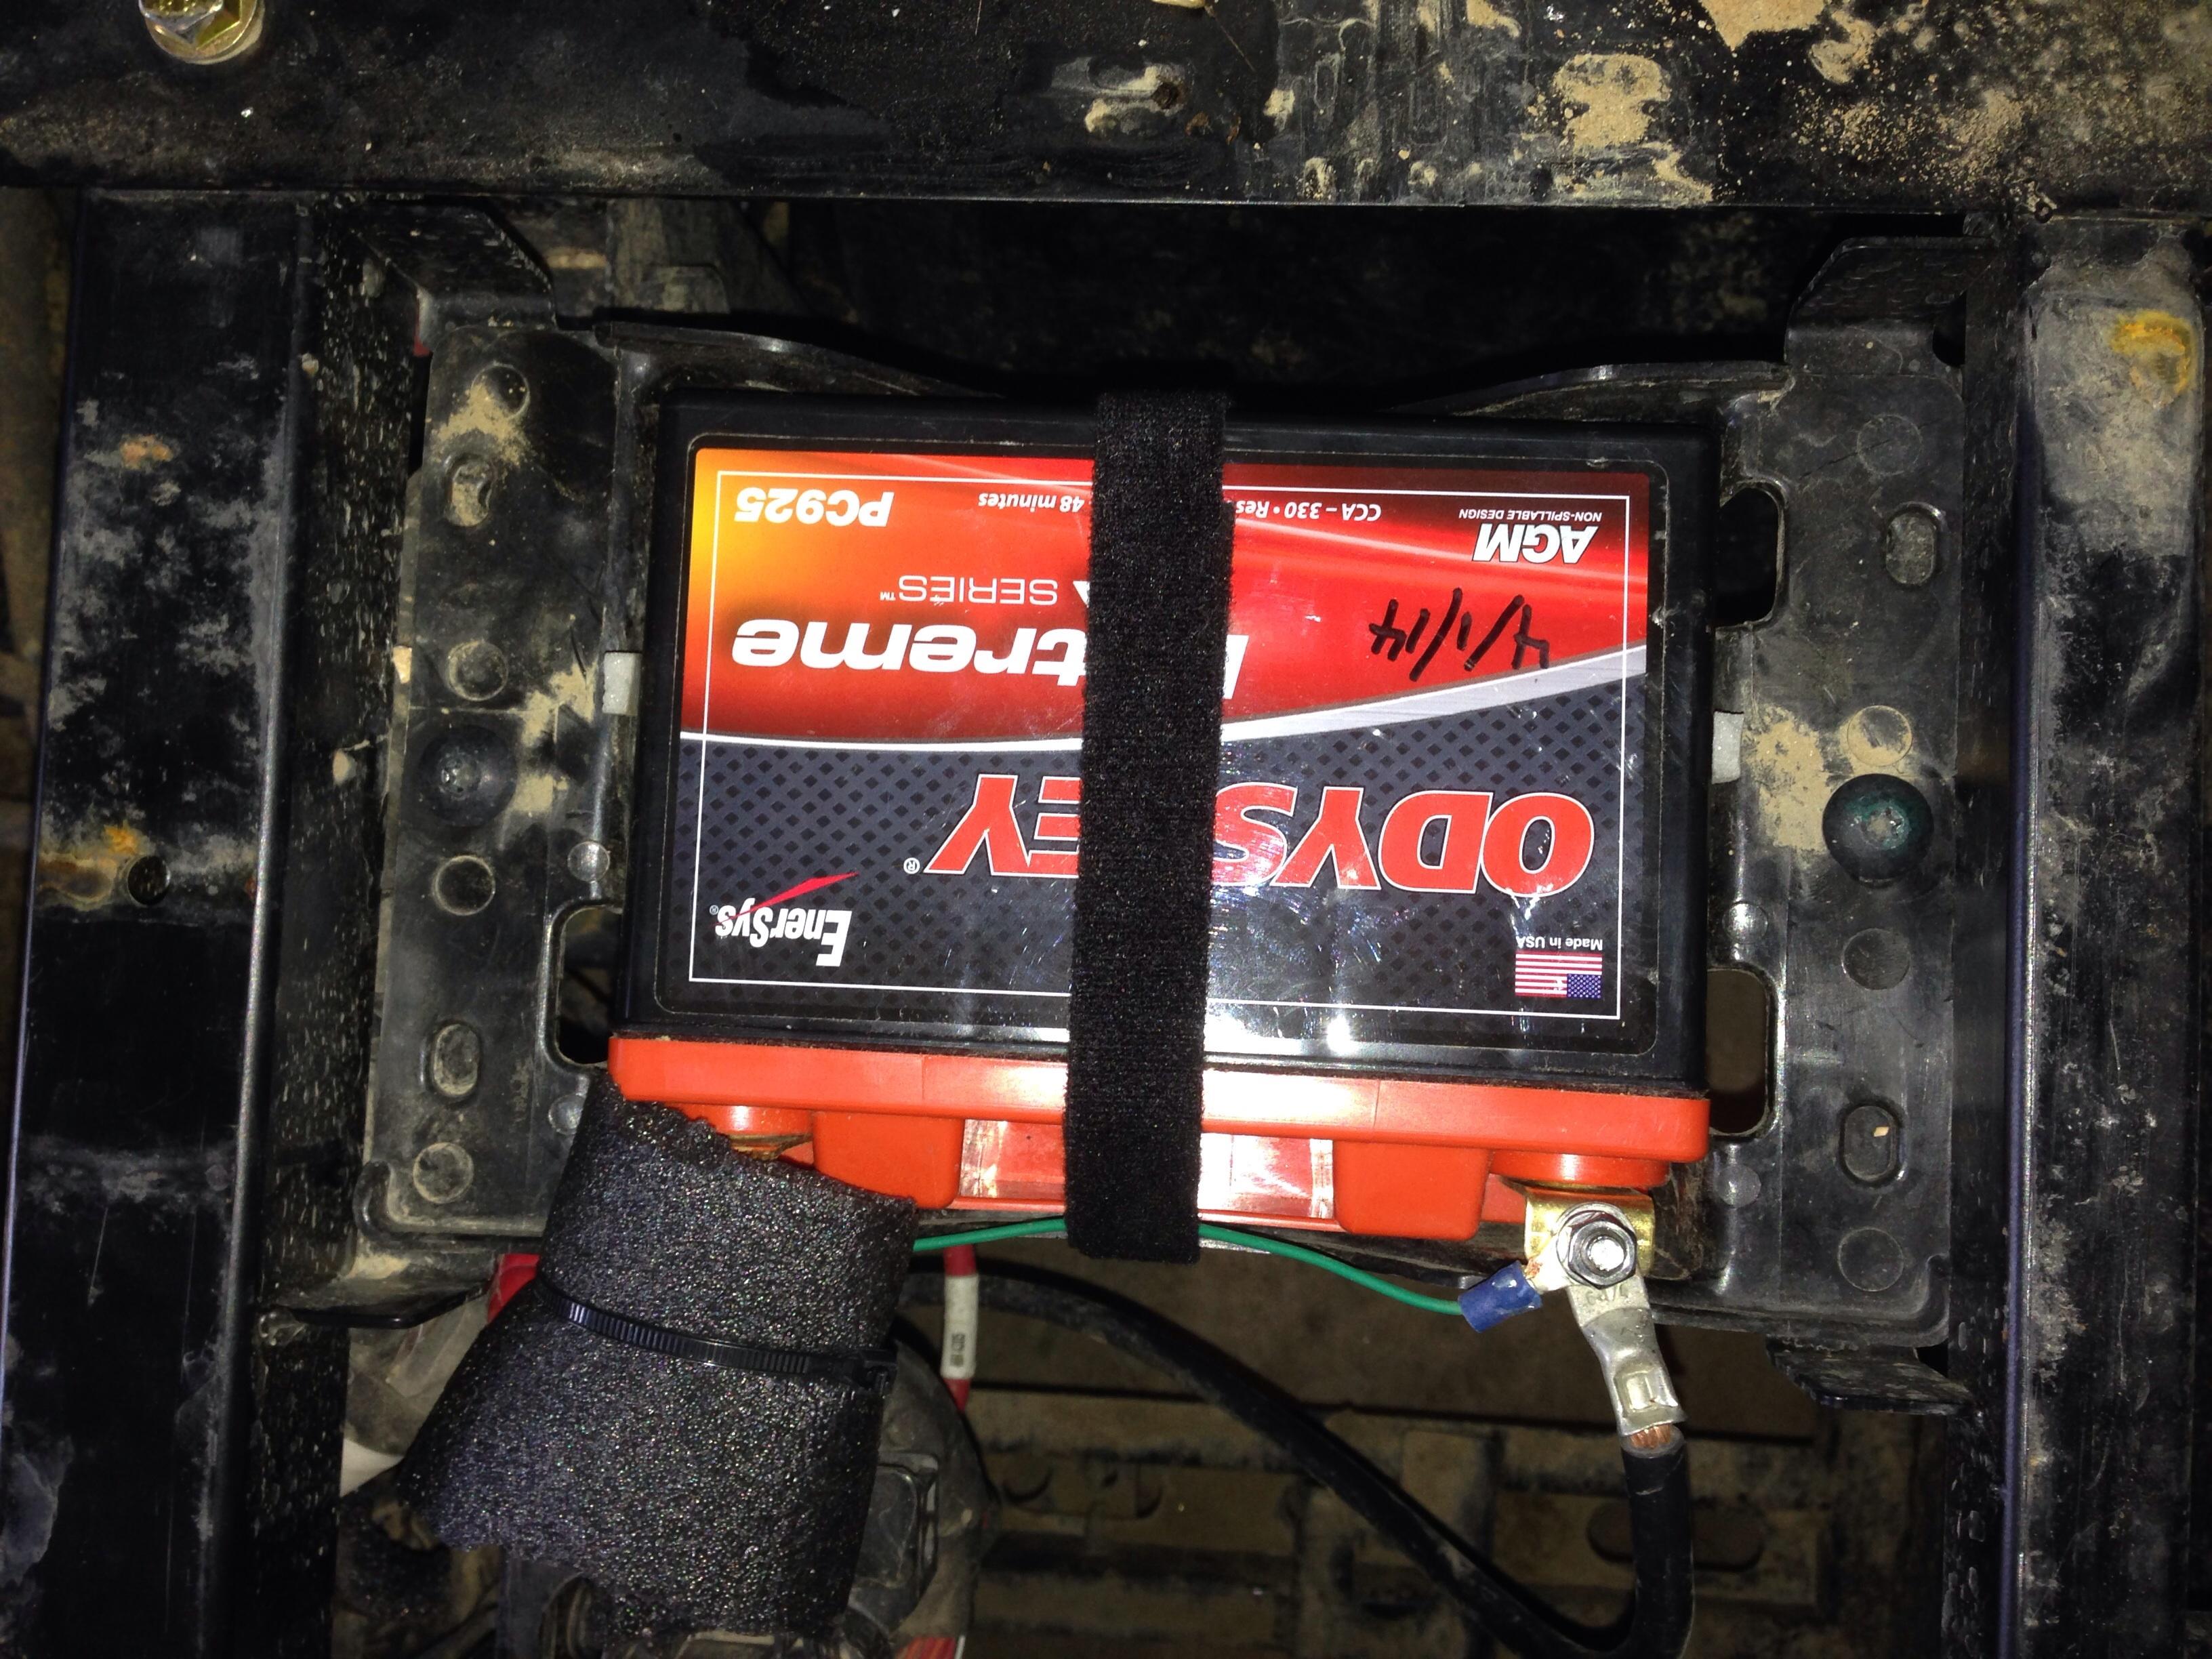 New Odyssey Pc925 Battery Install